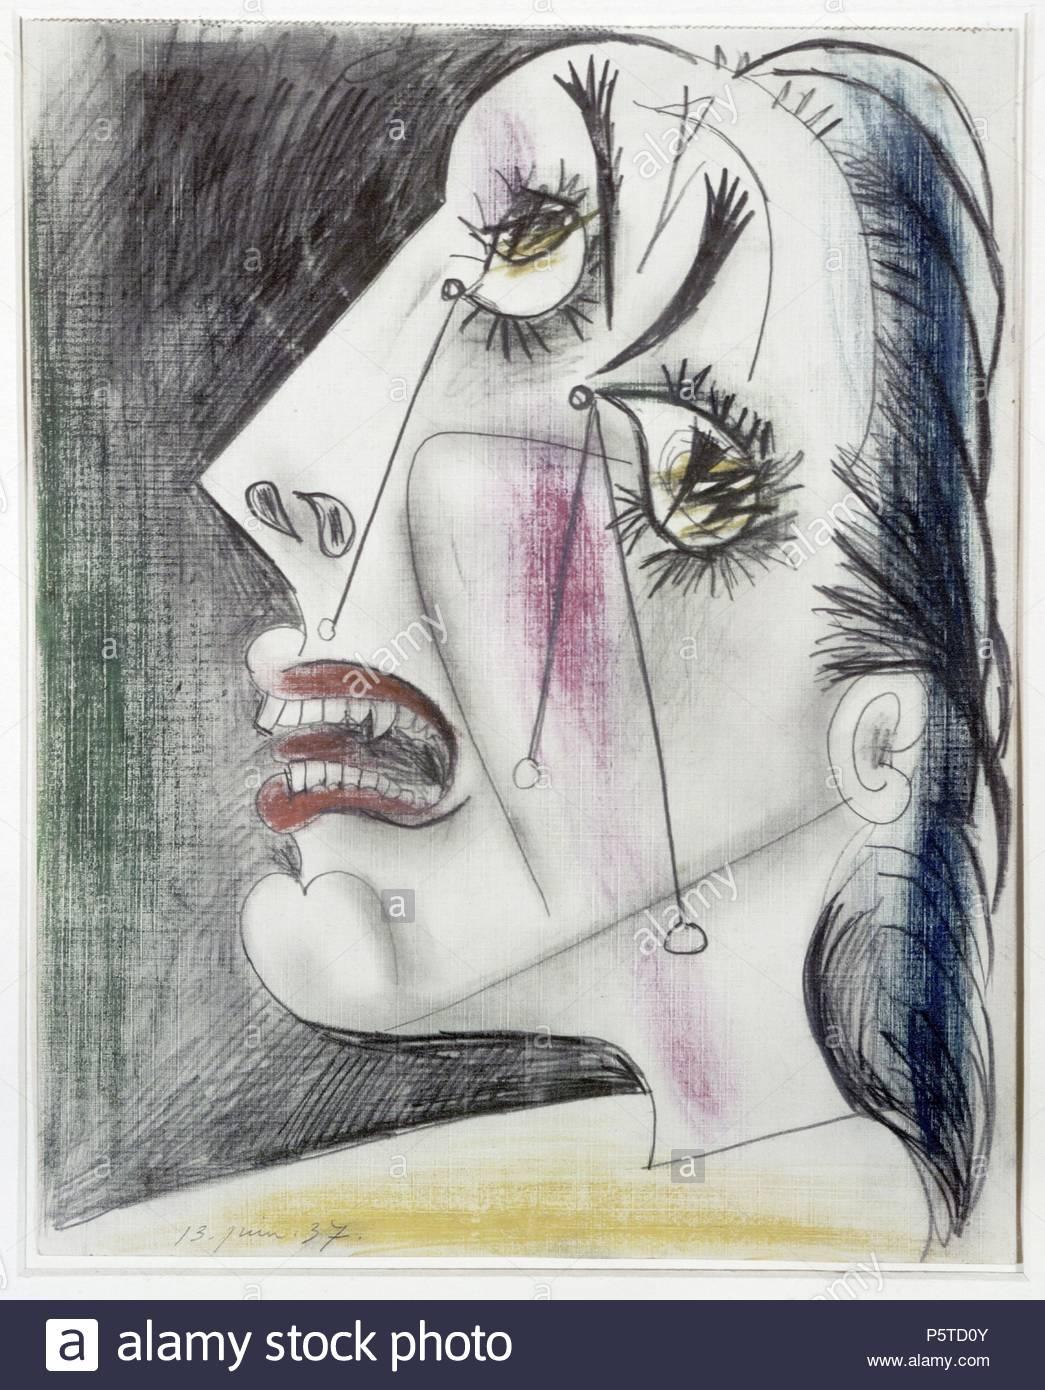 Pablo Picasso / 'Woman Crying (Study for Guernica)', 1937, Pencil on paper, 29 x 23 cm. Artwork also known as: Mujer llorando (estudo para Guernica). Museum: Museo Nacional Centro de Arte Reina Sofía (MNCARS). - Stock Image